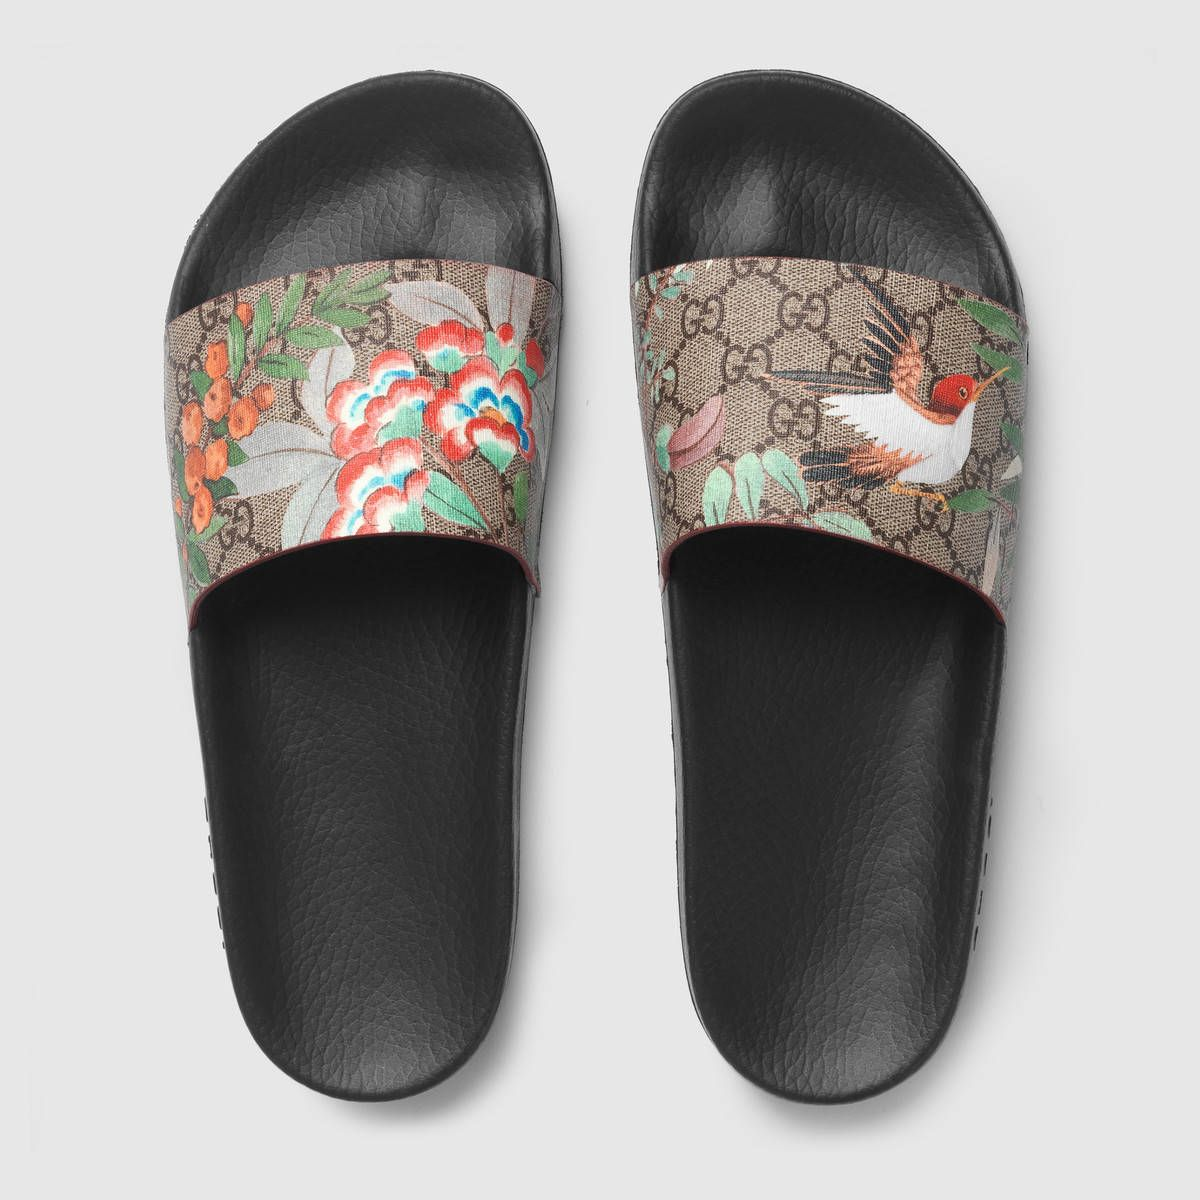 36cdaa3f695 Men s Gucci Tian Slide Sandal  My Style Shoes